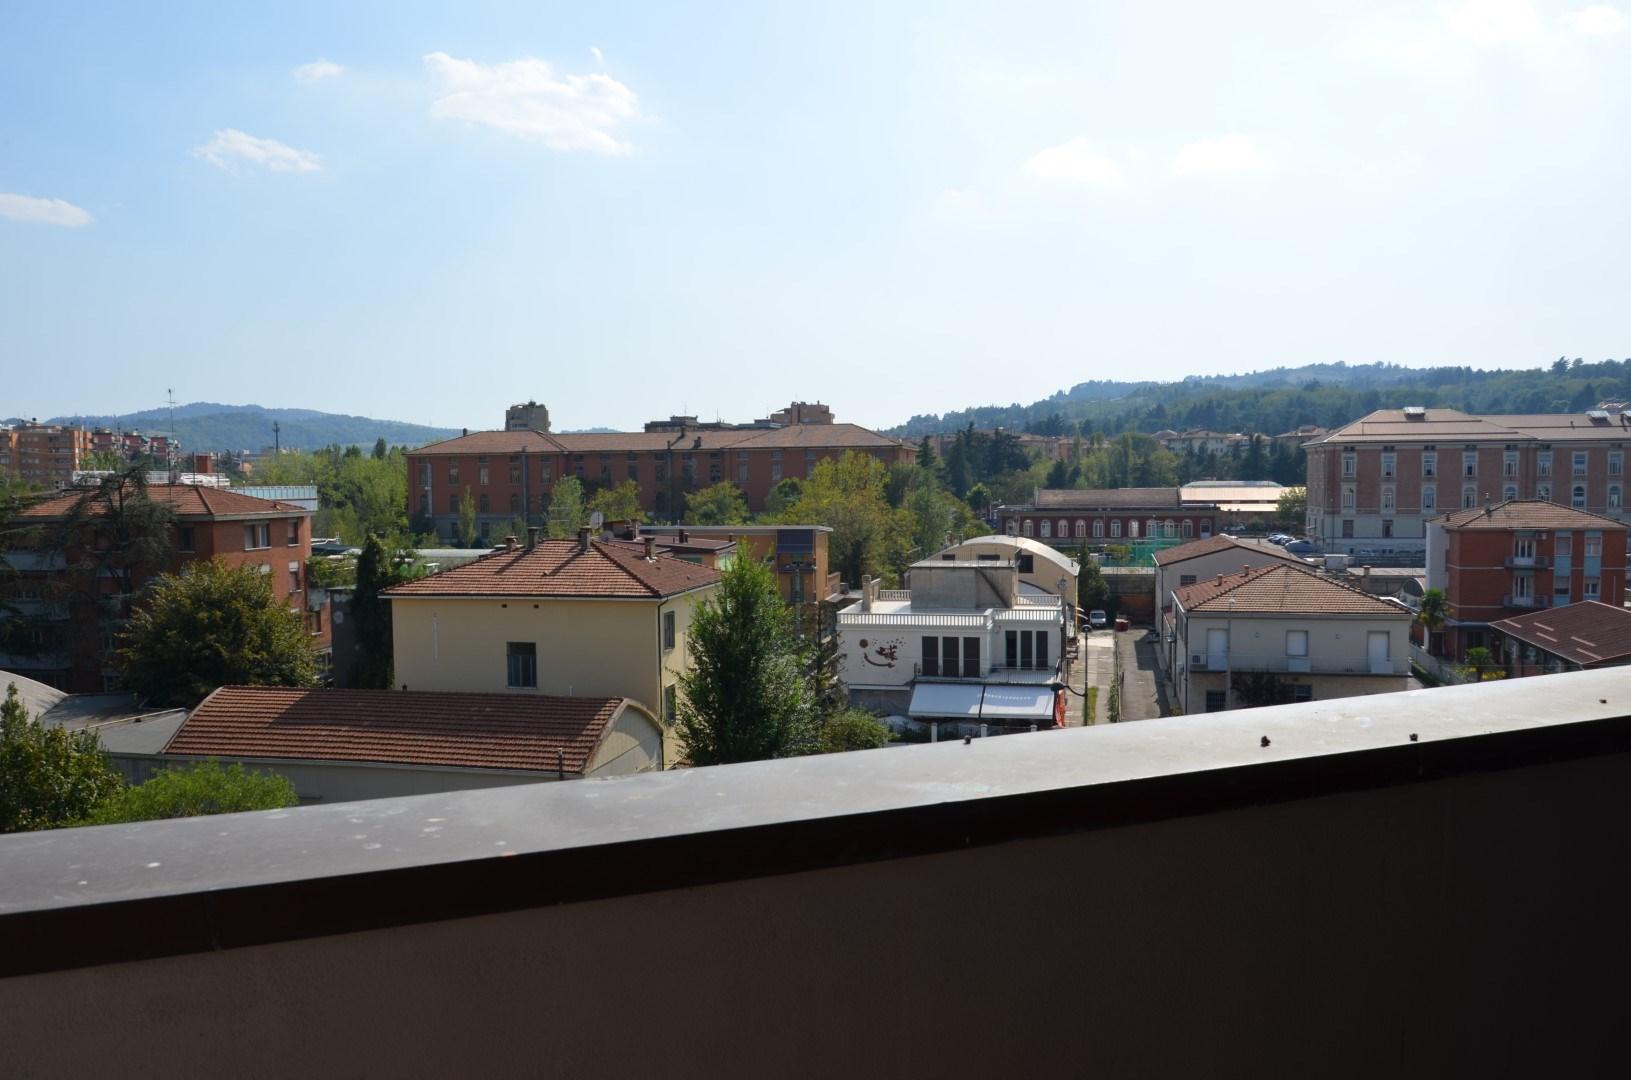 Attico / Mansarda Toscana/S. Ruffillo